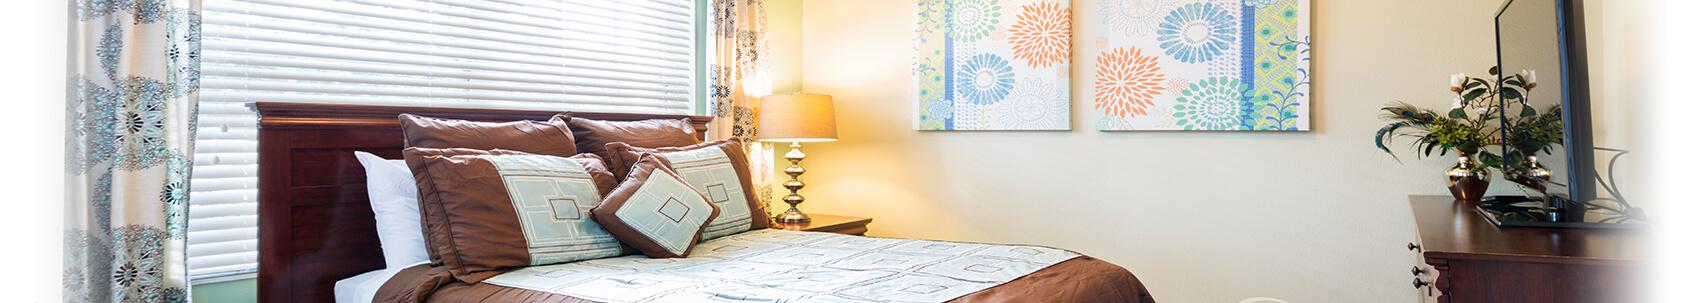 Orlando villa rentals from VillaDirect vacation homes